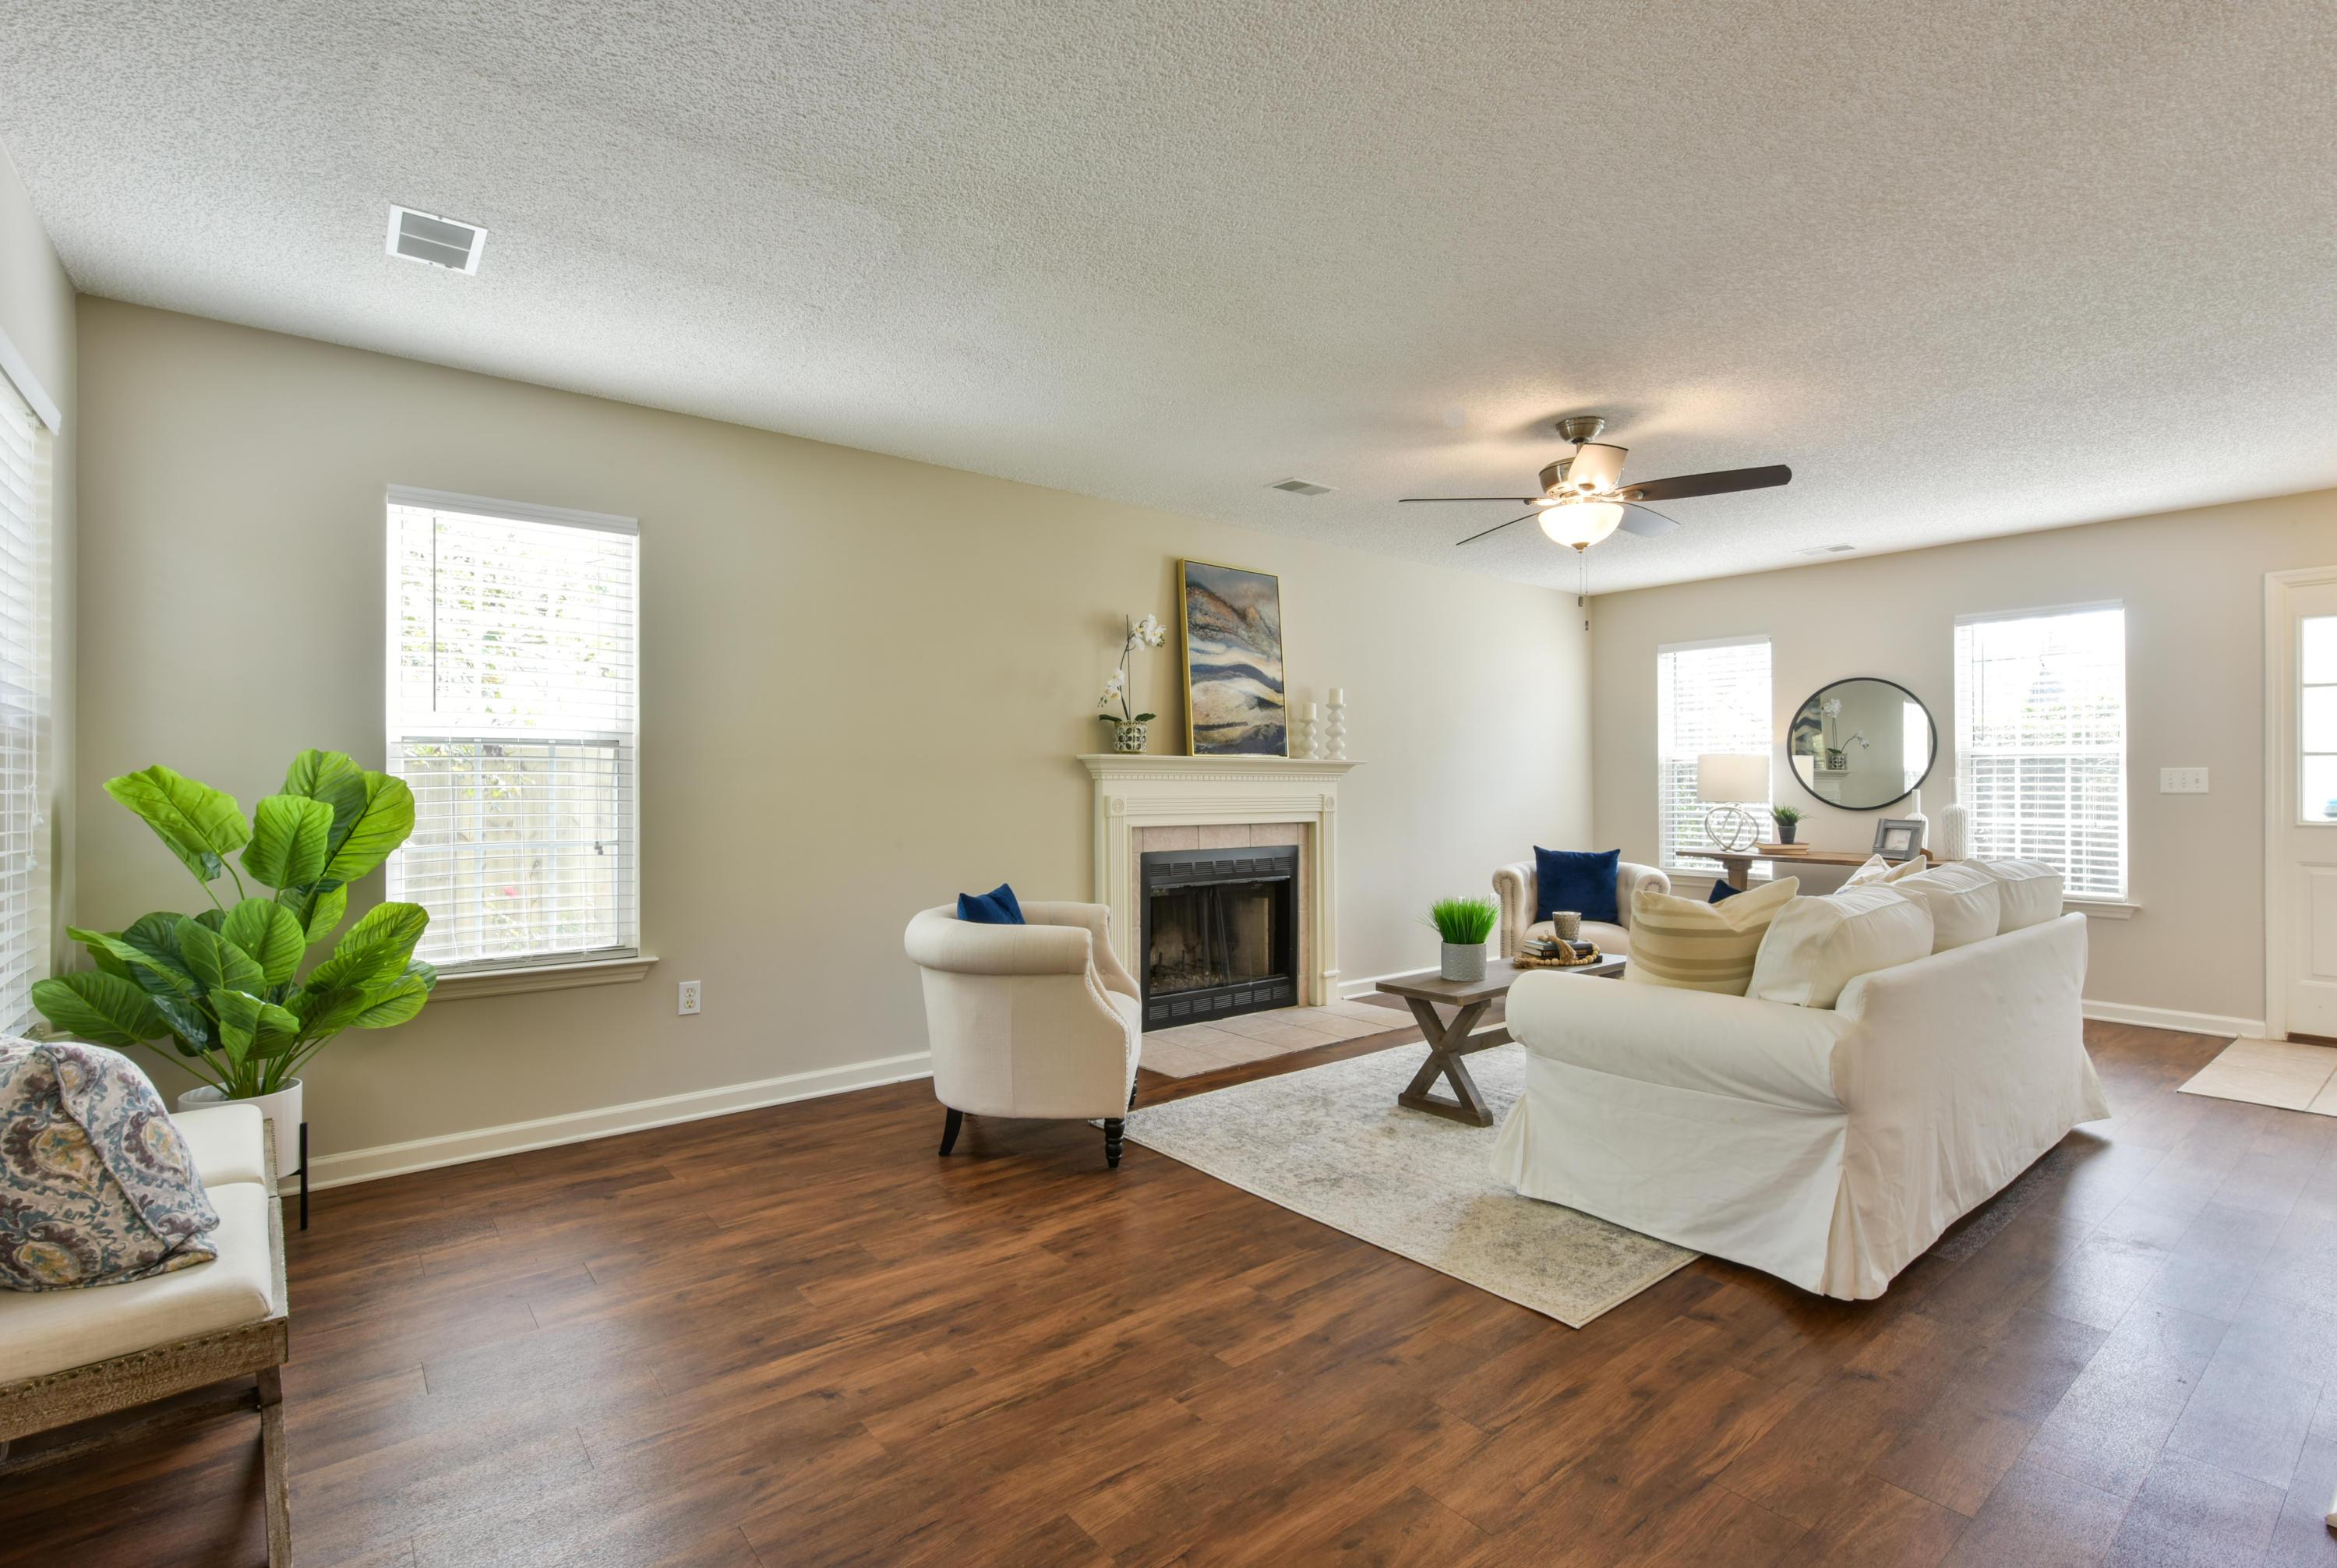 Ivy Hall Homes For Sale - 3048 Morningdale, Mount Pleasant, SC - 17